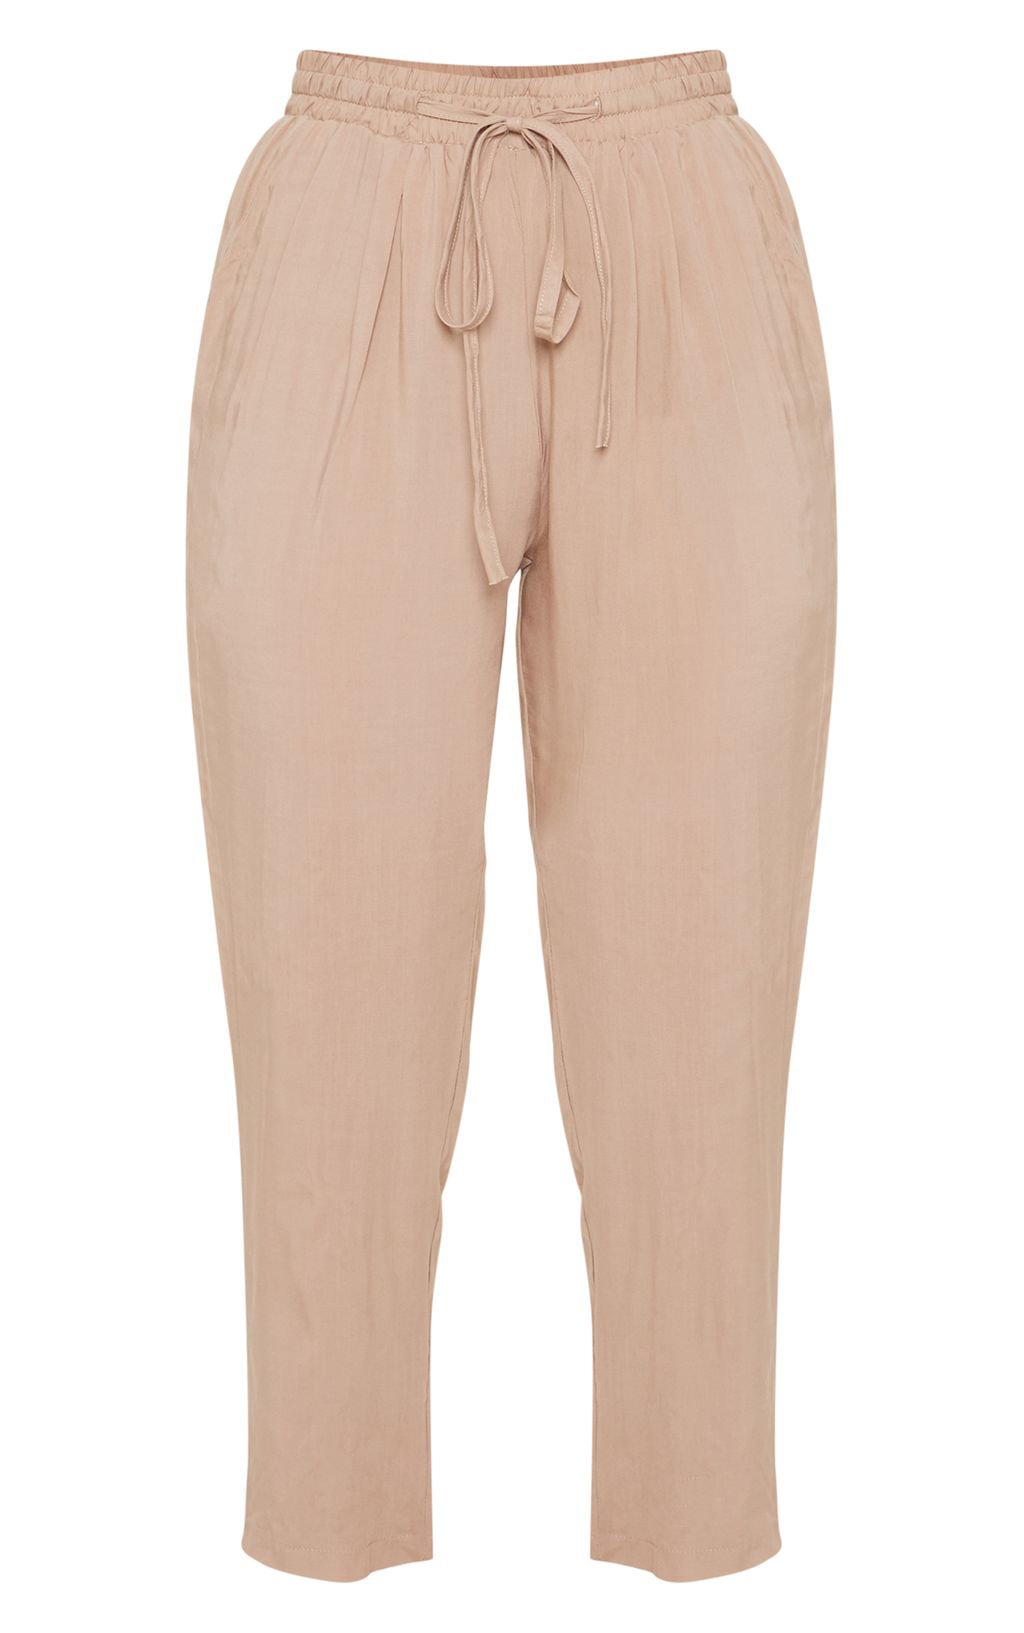 Petite Khaki Casual Trousers | PrettyLittleThing